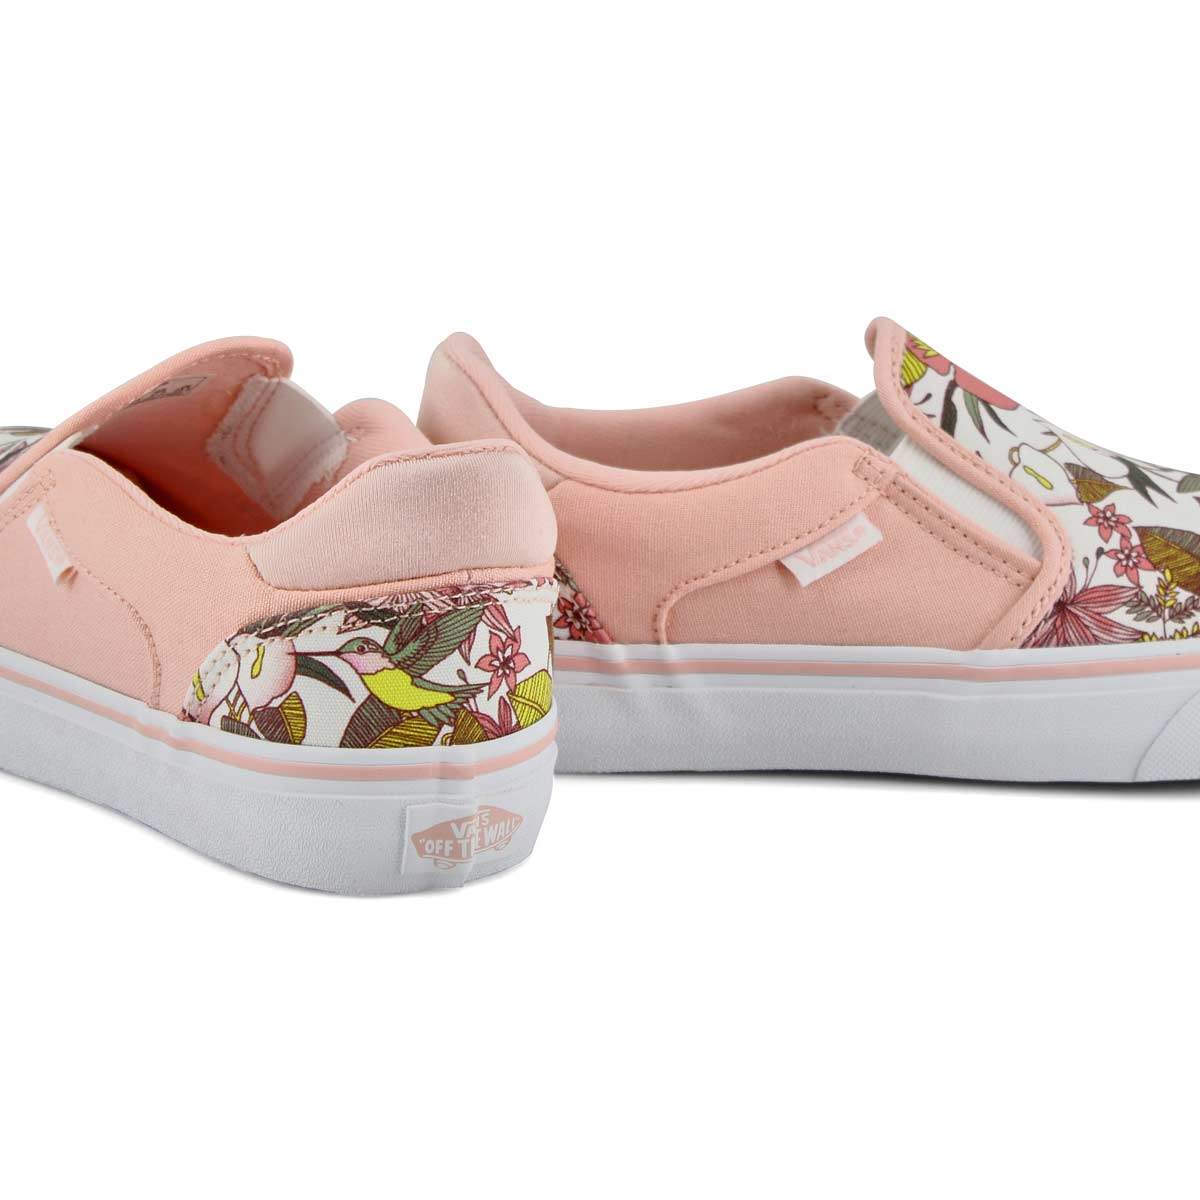 Women's Asher Deluxe Sneaker - Pearl White